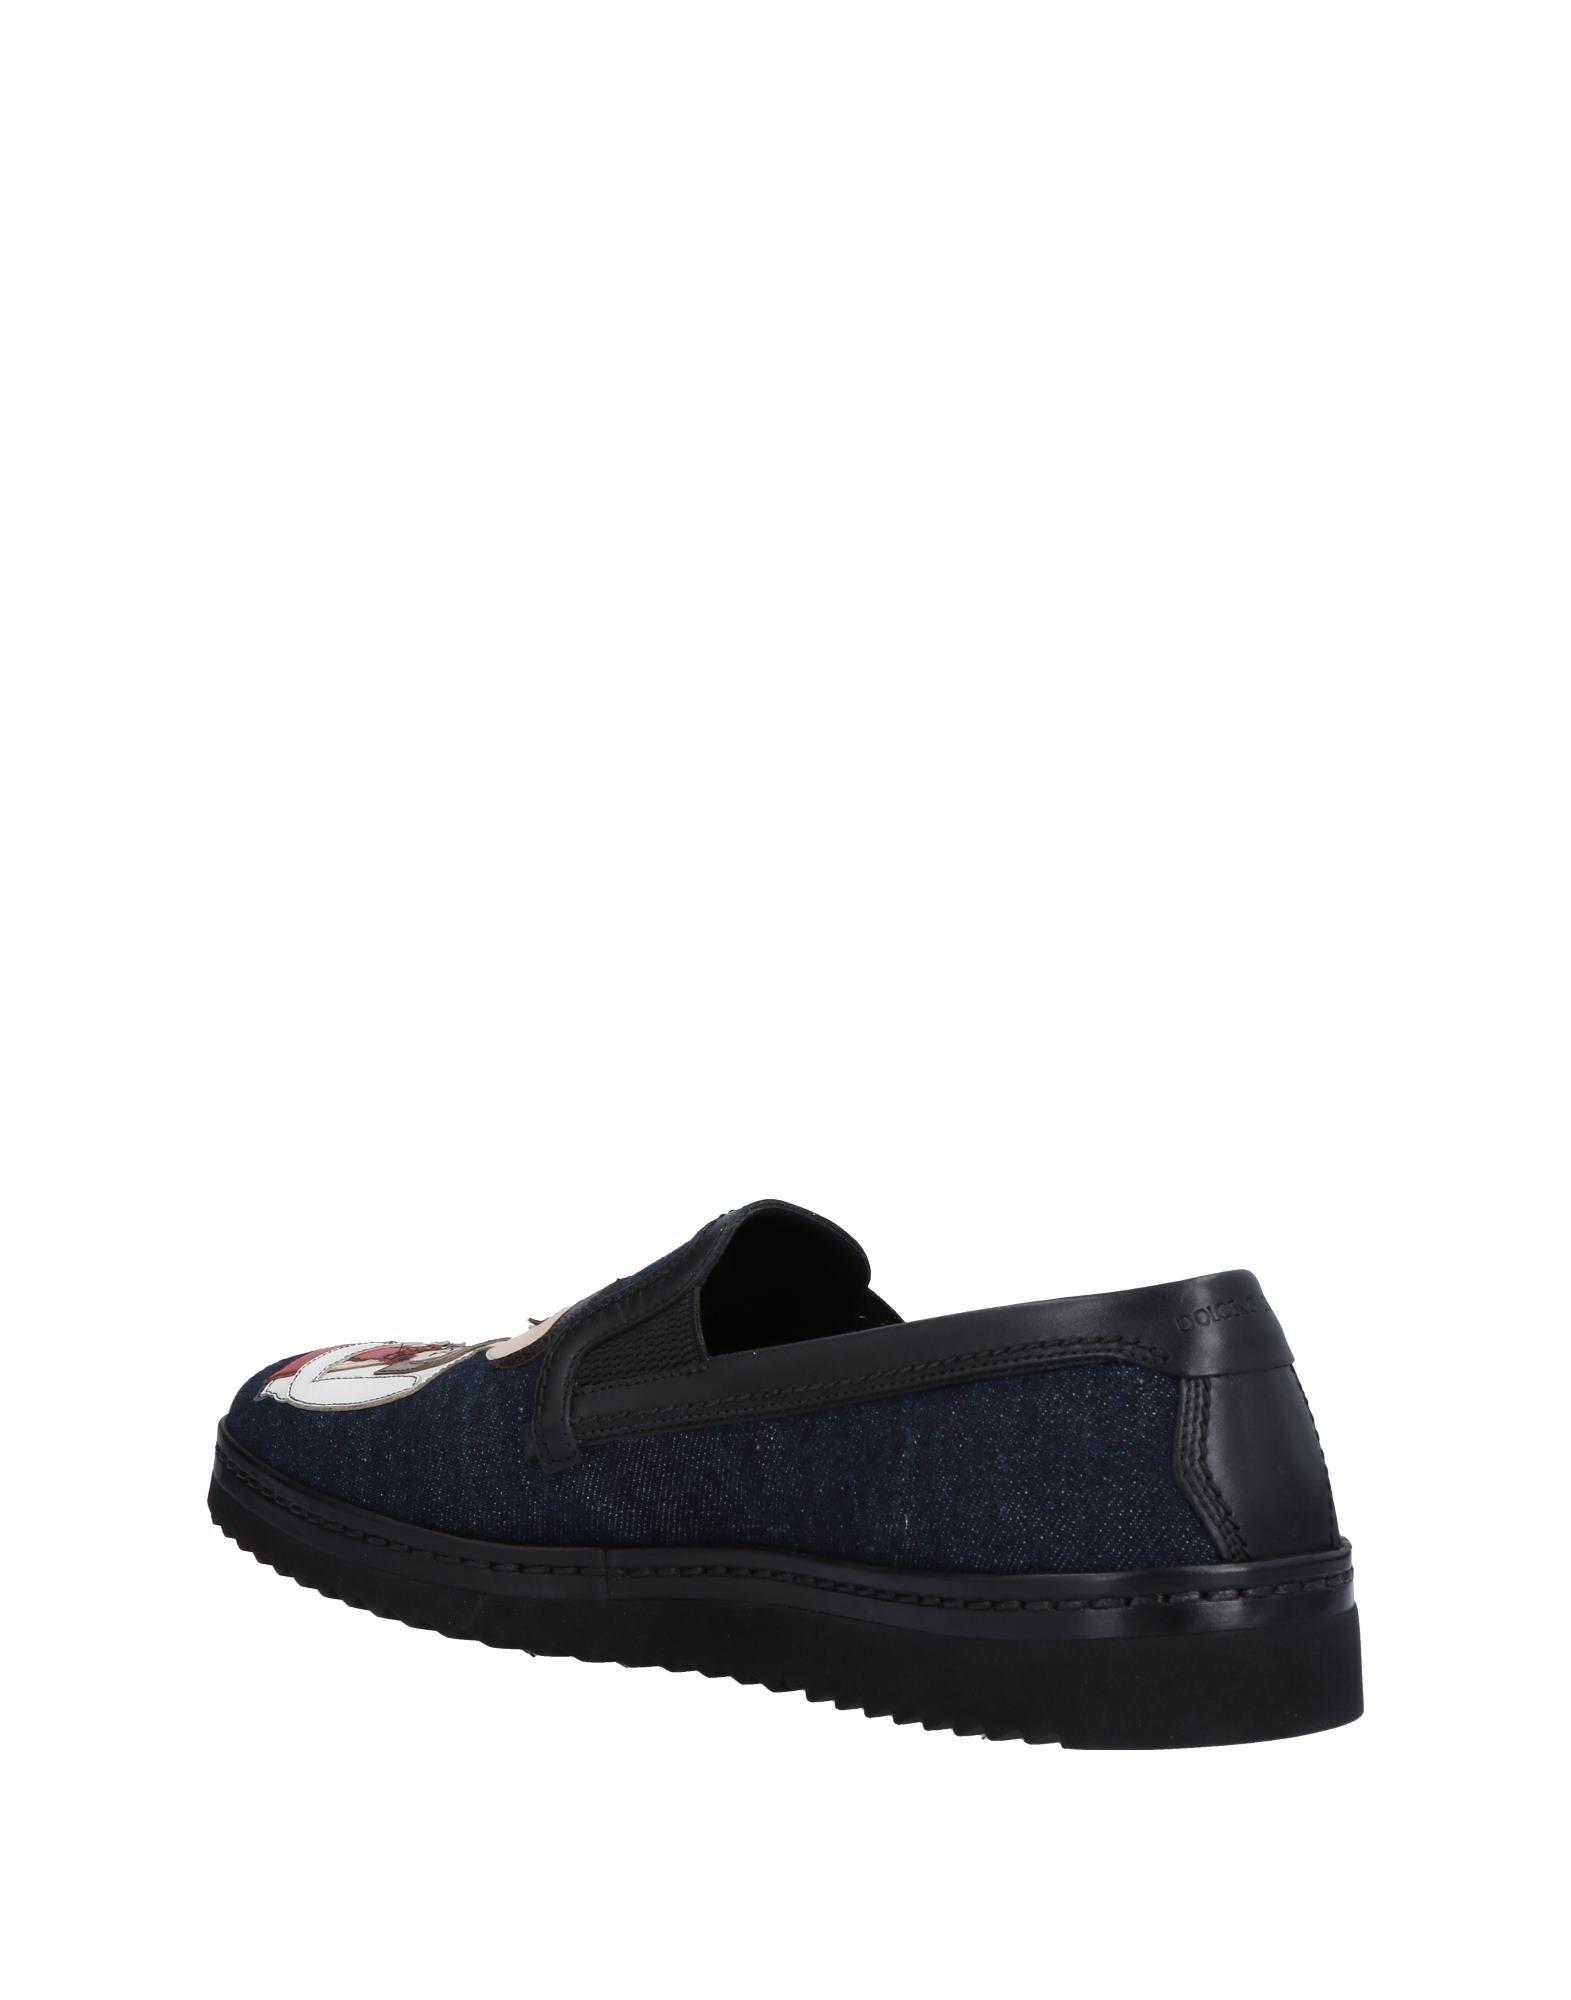 Dolce & Gabbana Neue Sneakers Herren  11492682LH Neue Gabbana Schuhe f45f70